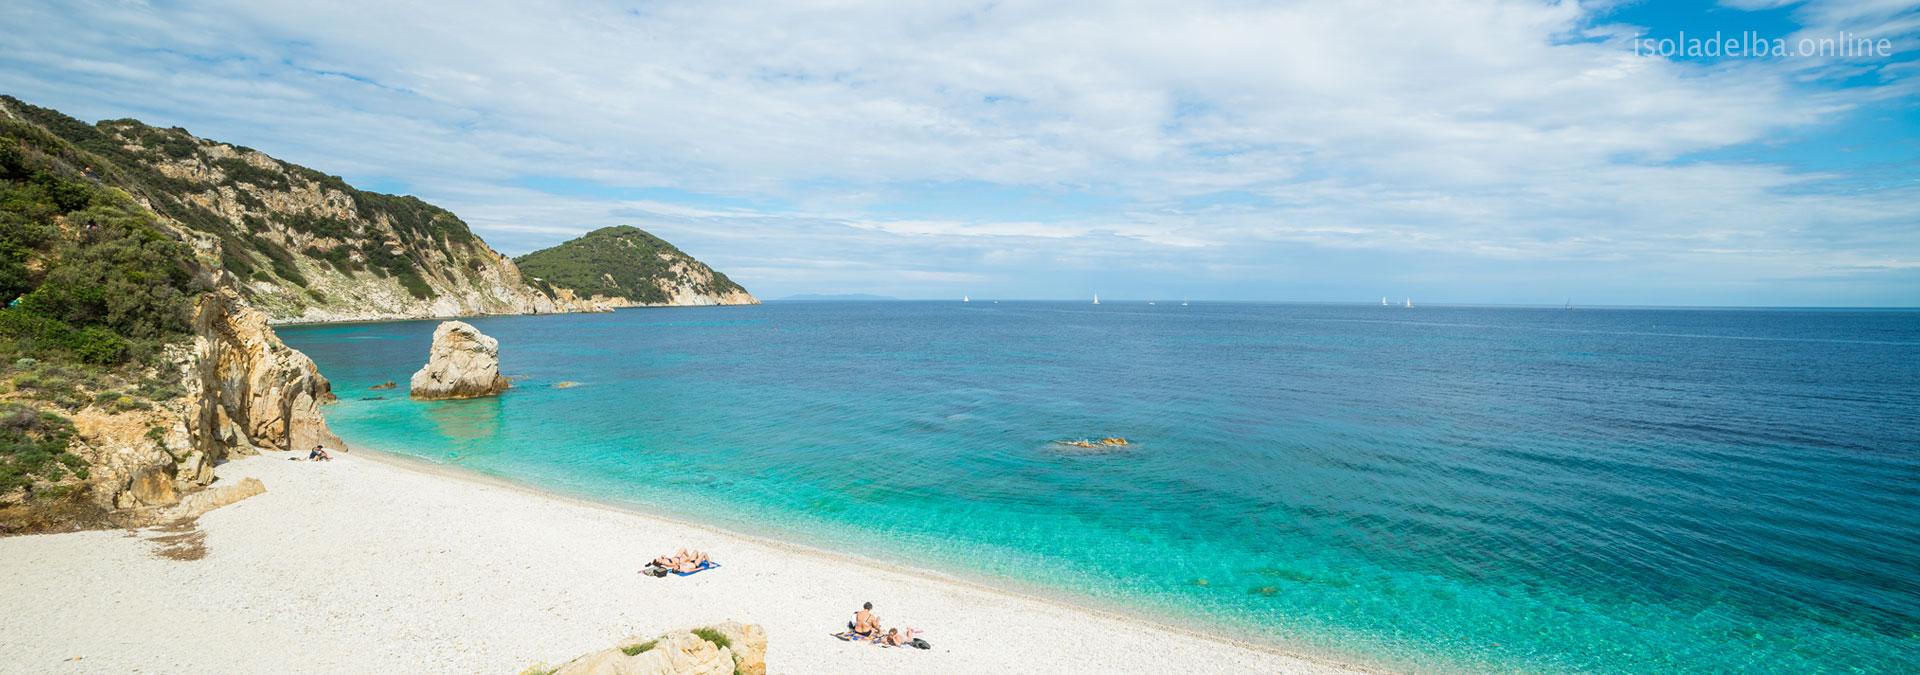 Appartamenti Per Vacanze Isola D Elba